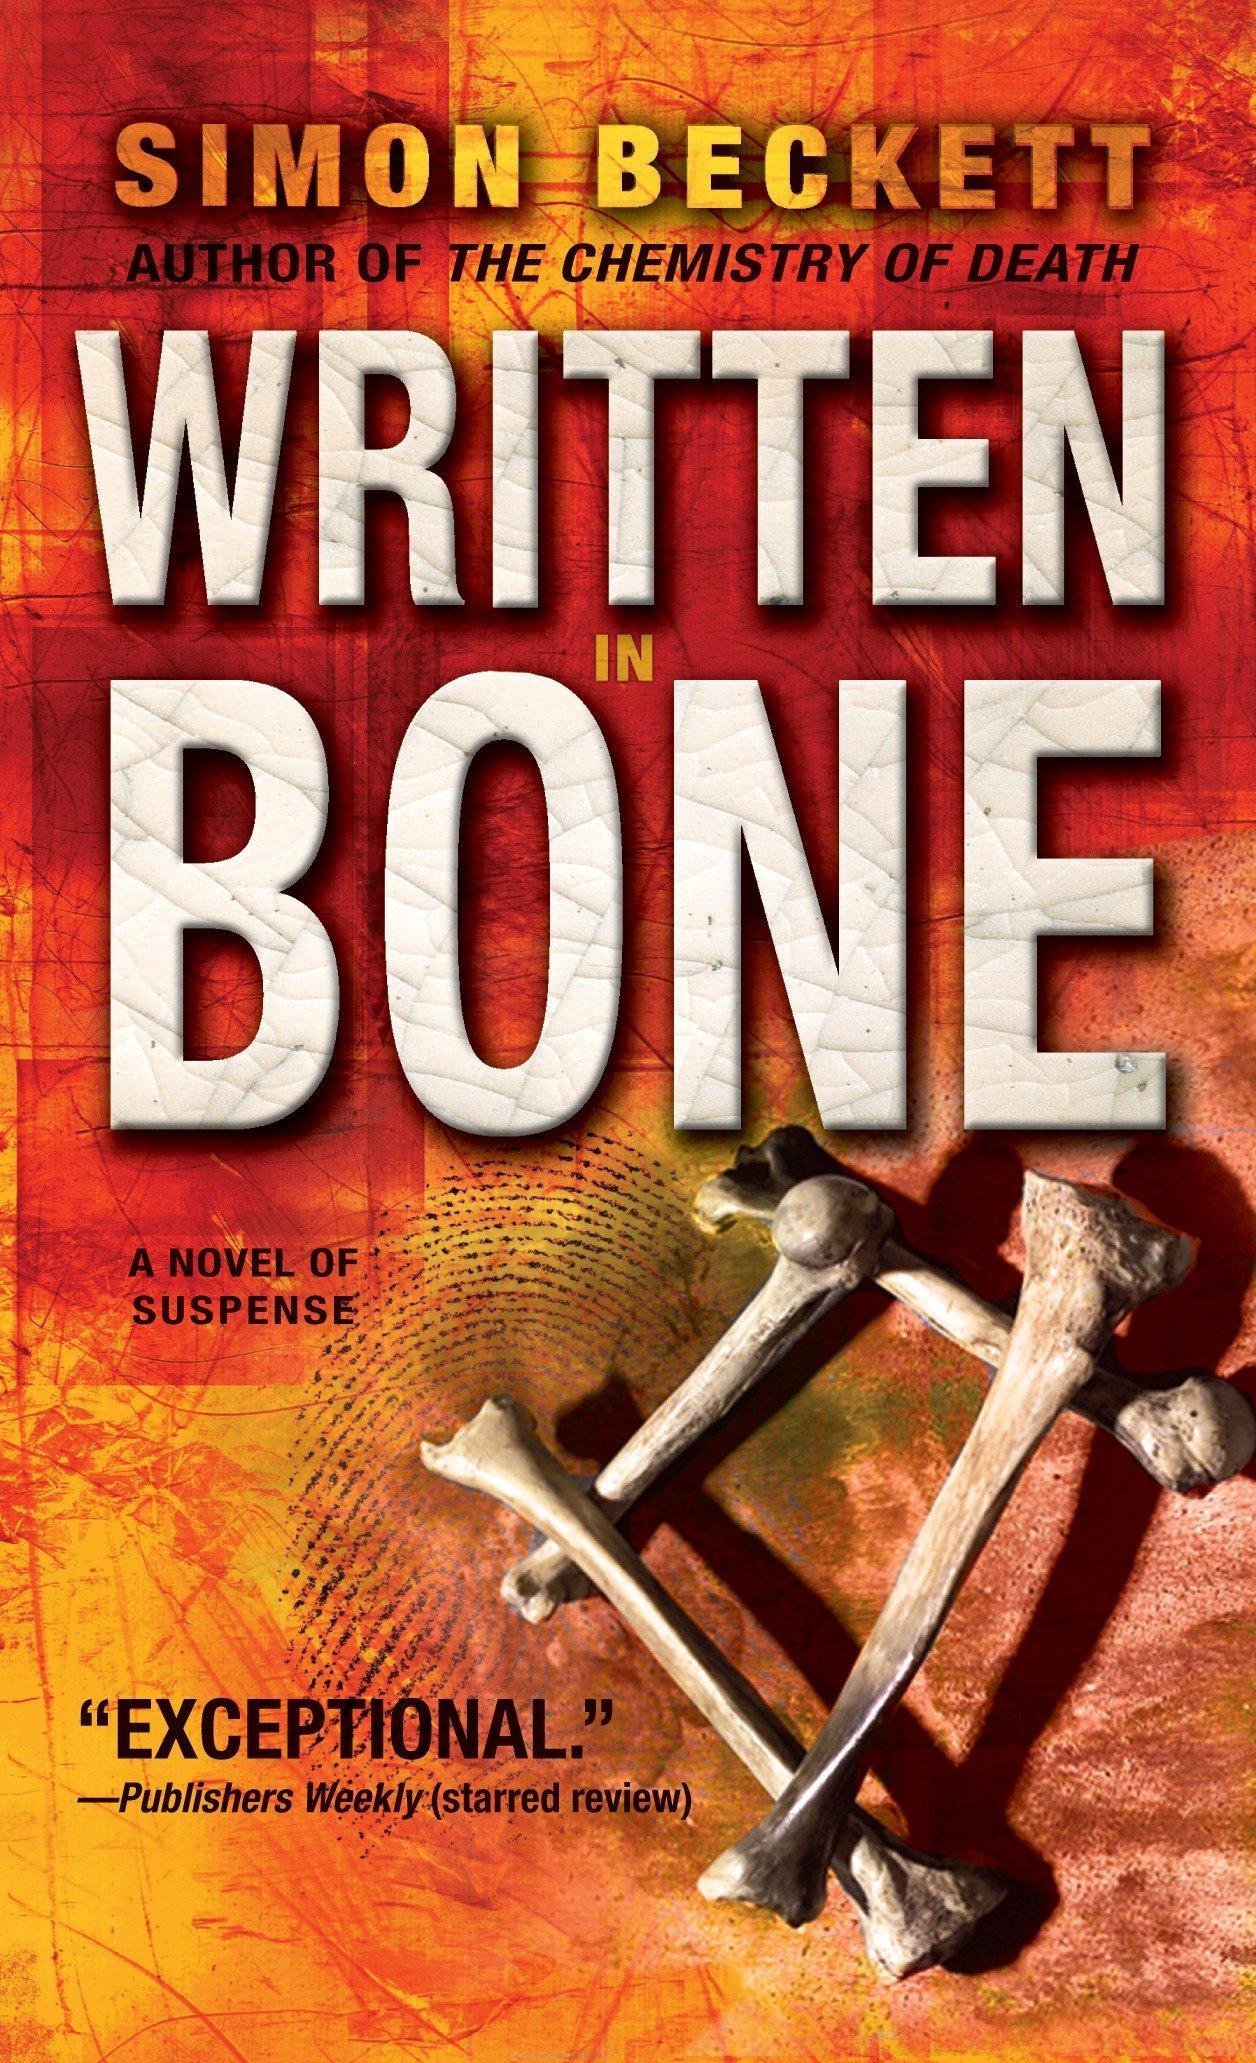 Amazon.com: Written in Bone (David Hunter) (9780440335962): Simon Beckett:  Books